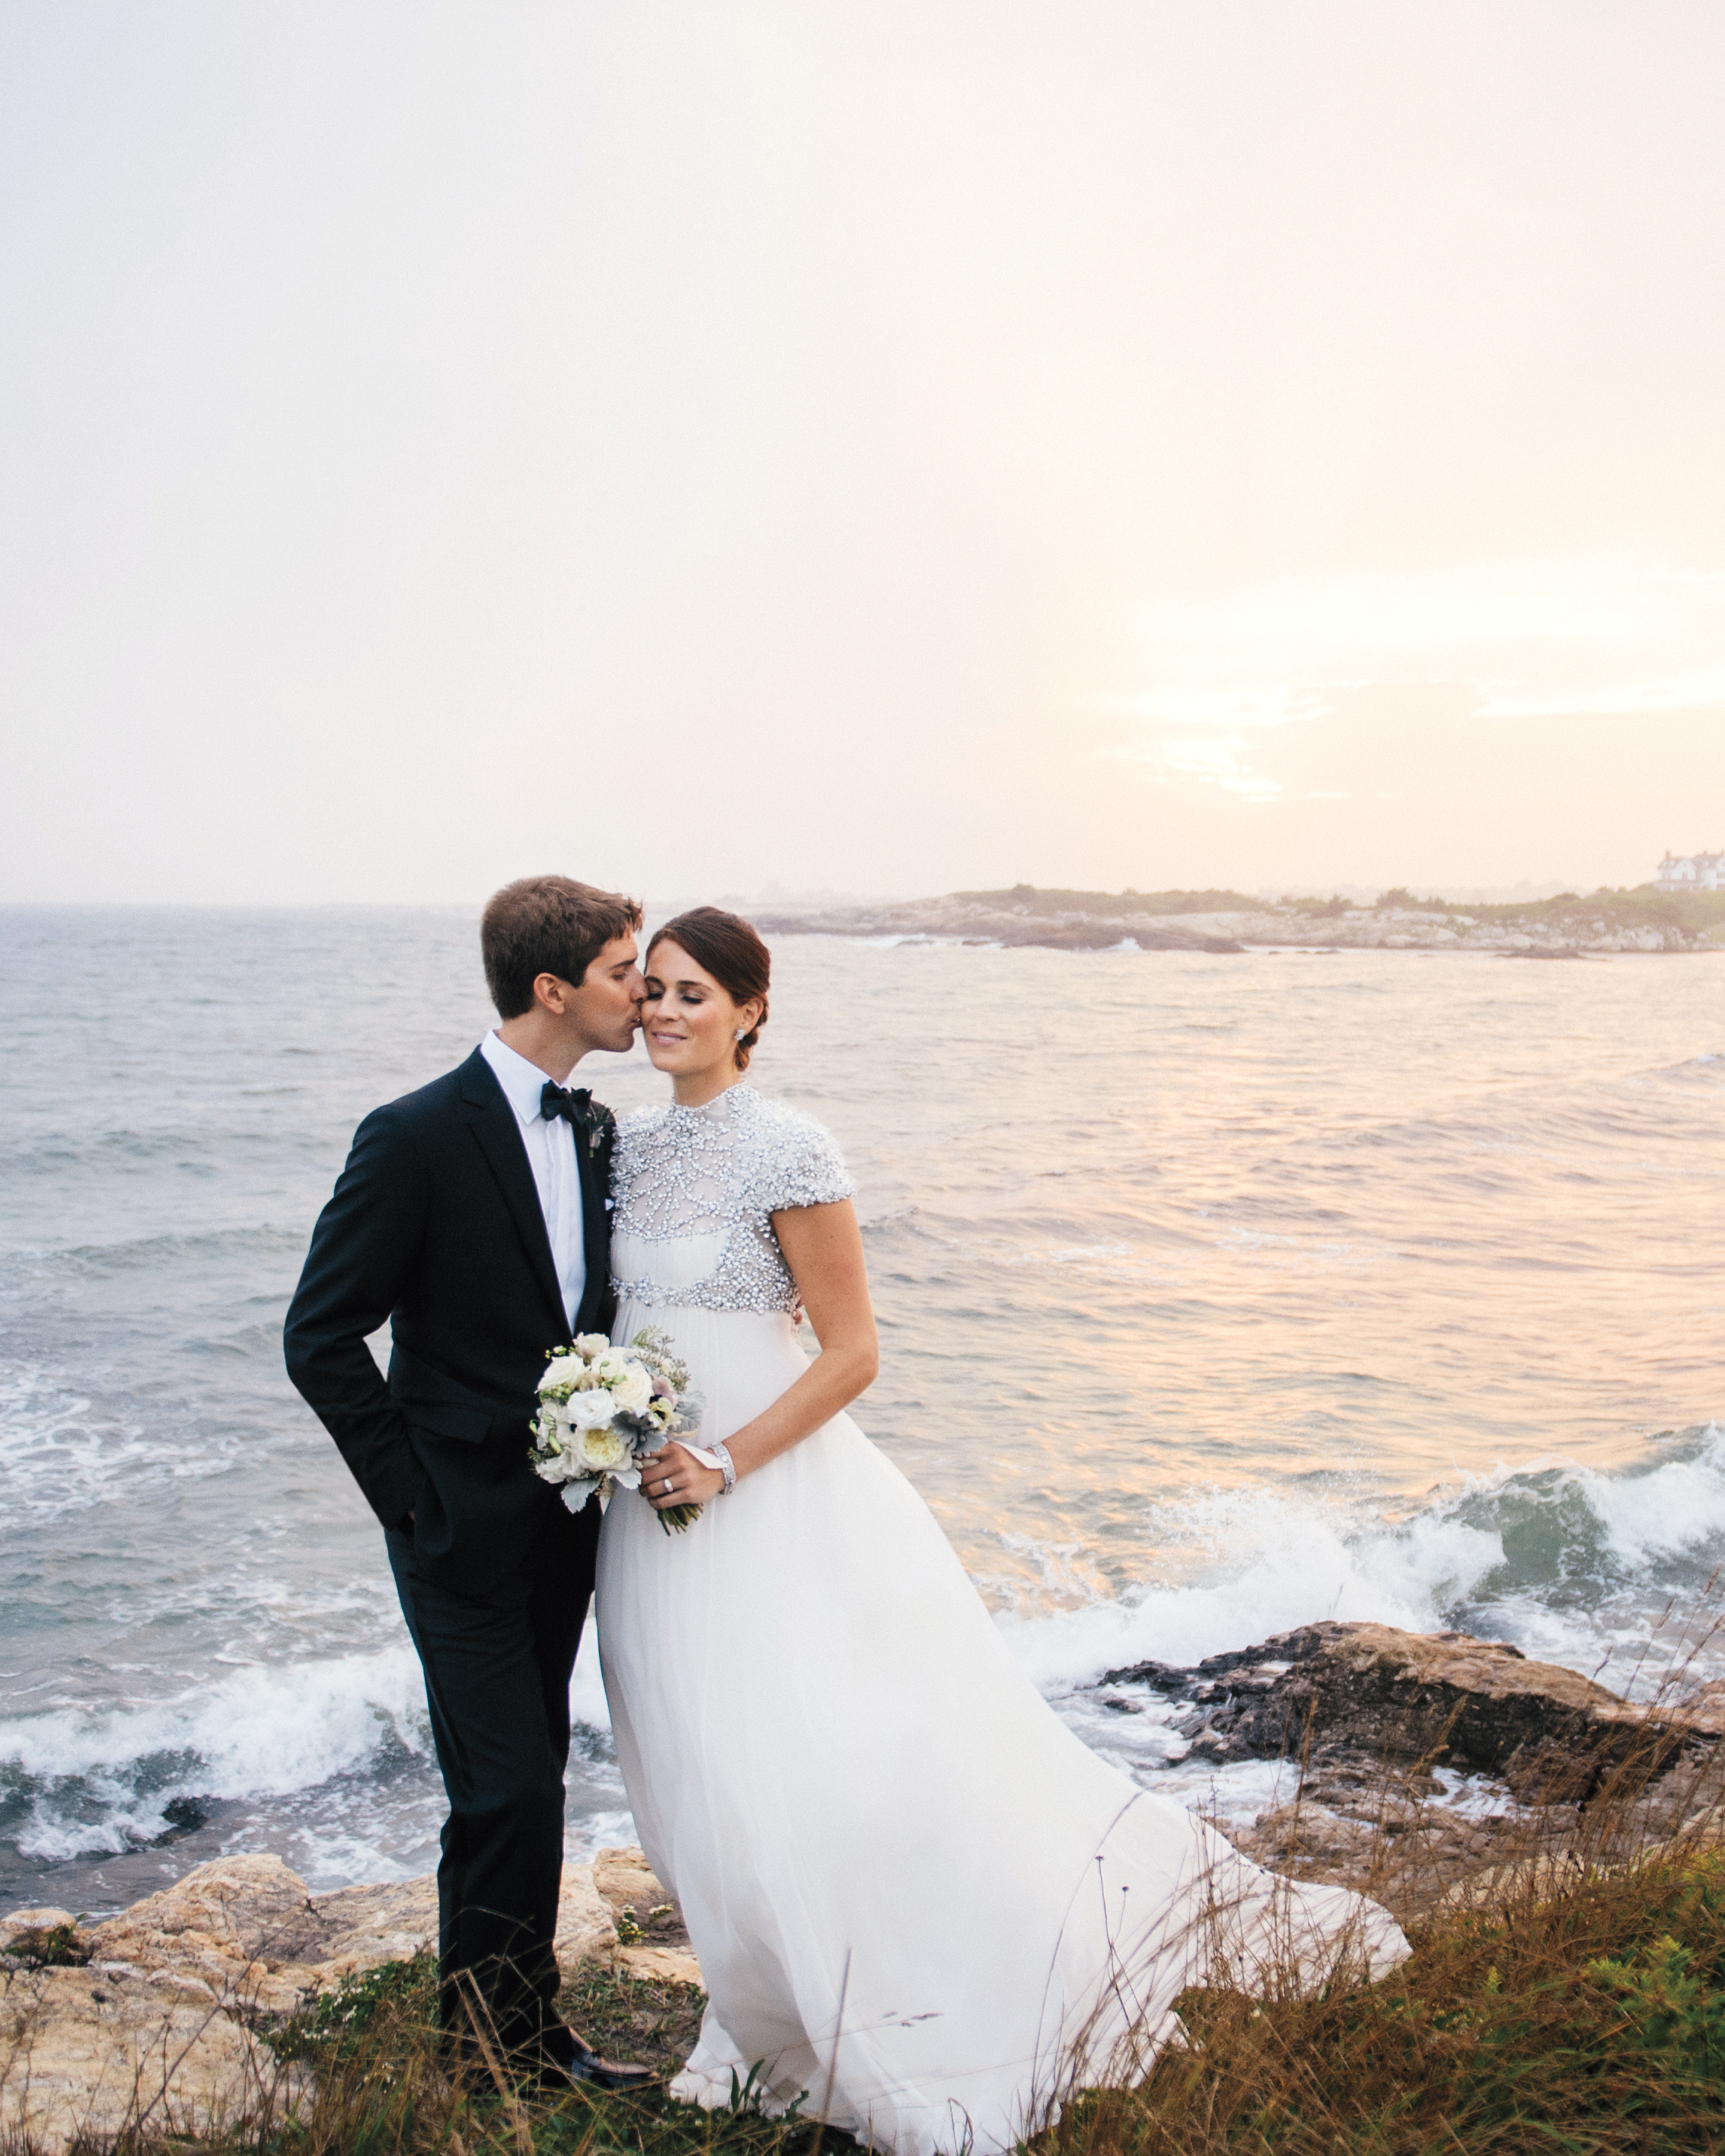 olivia-tyler-wedding-newport-sub-3-s111822.jpg